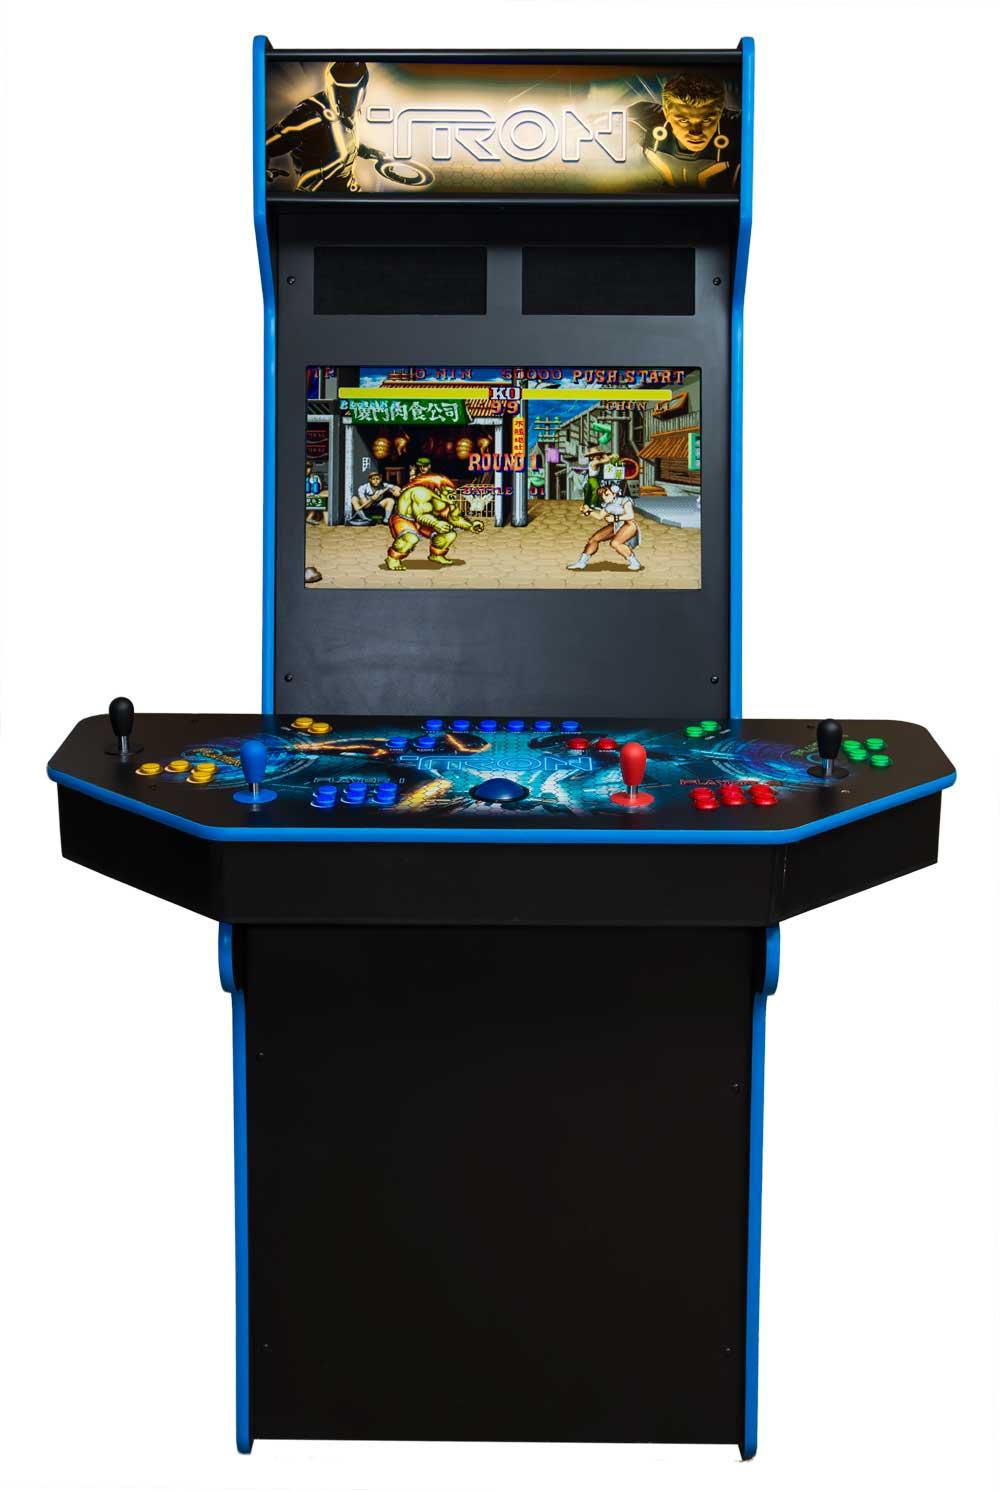 Similiar 4 Player Arcade Cabinet Plans Keywords